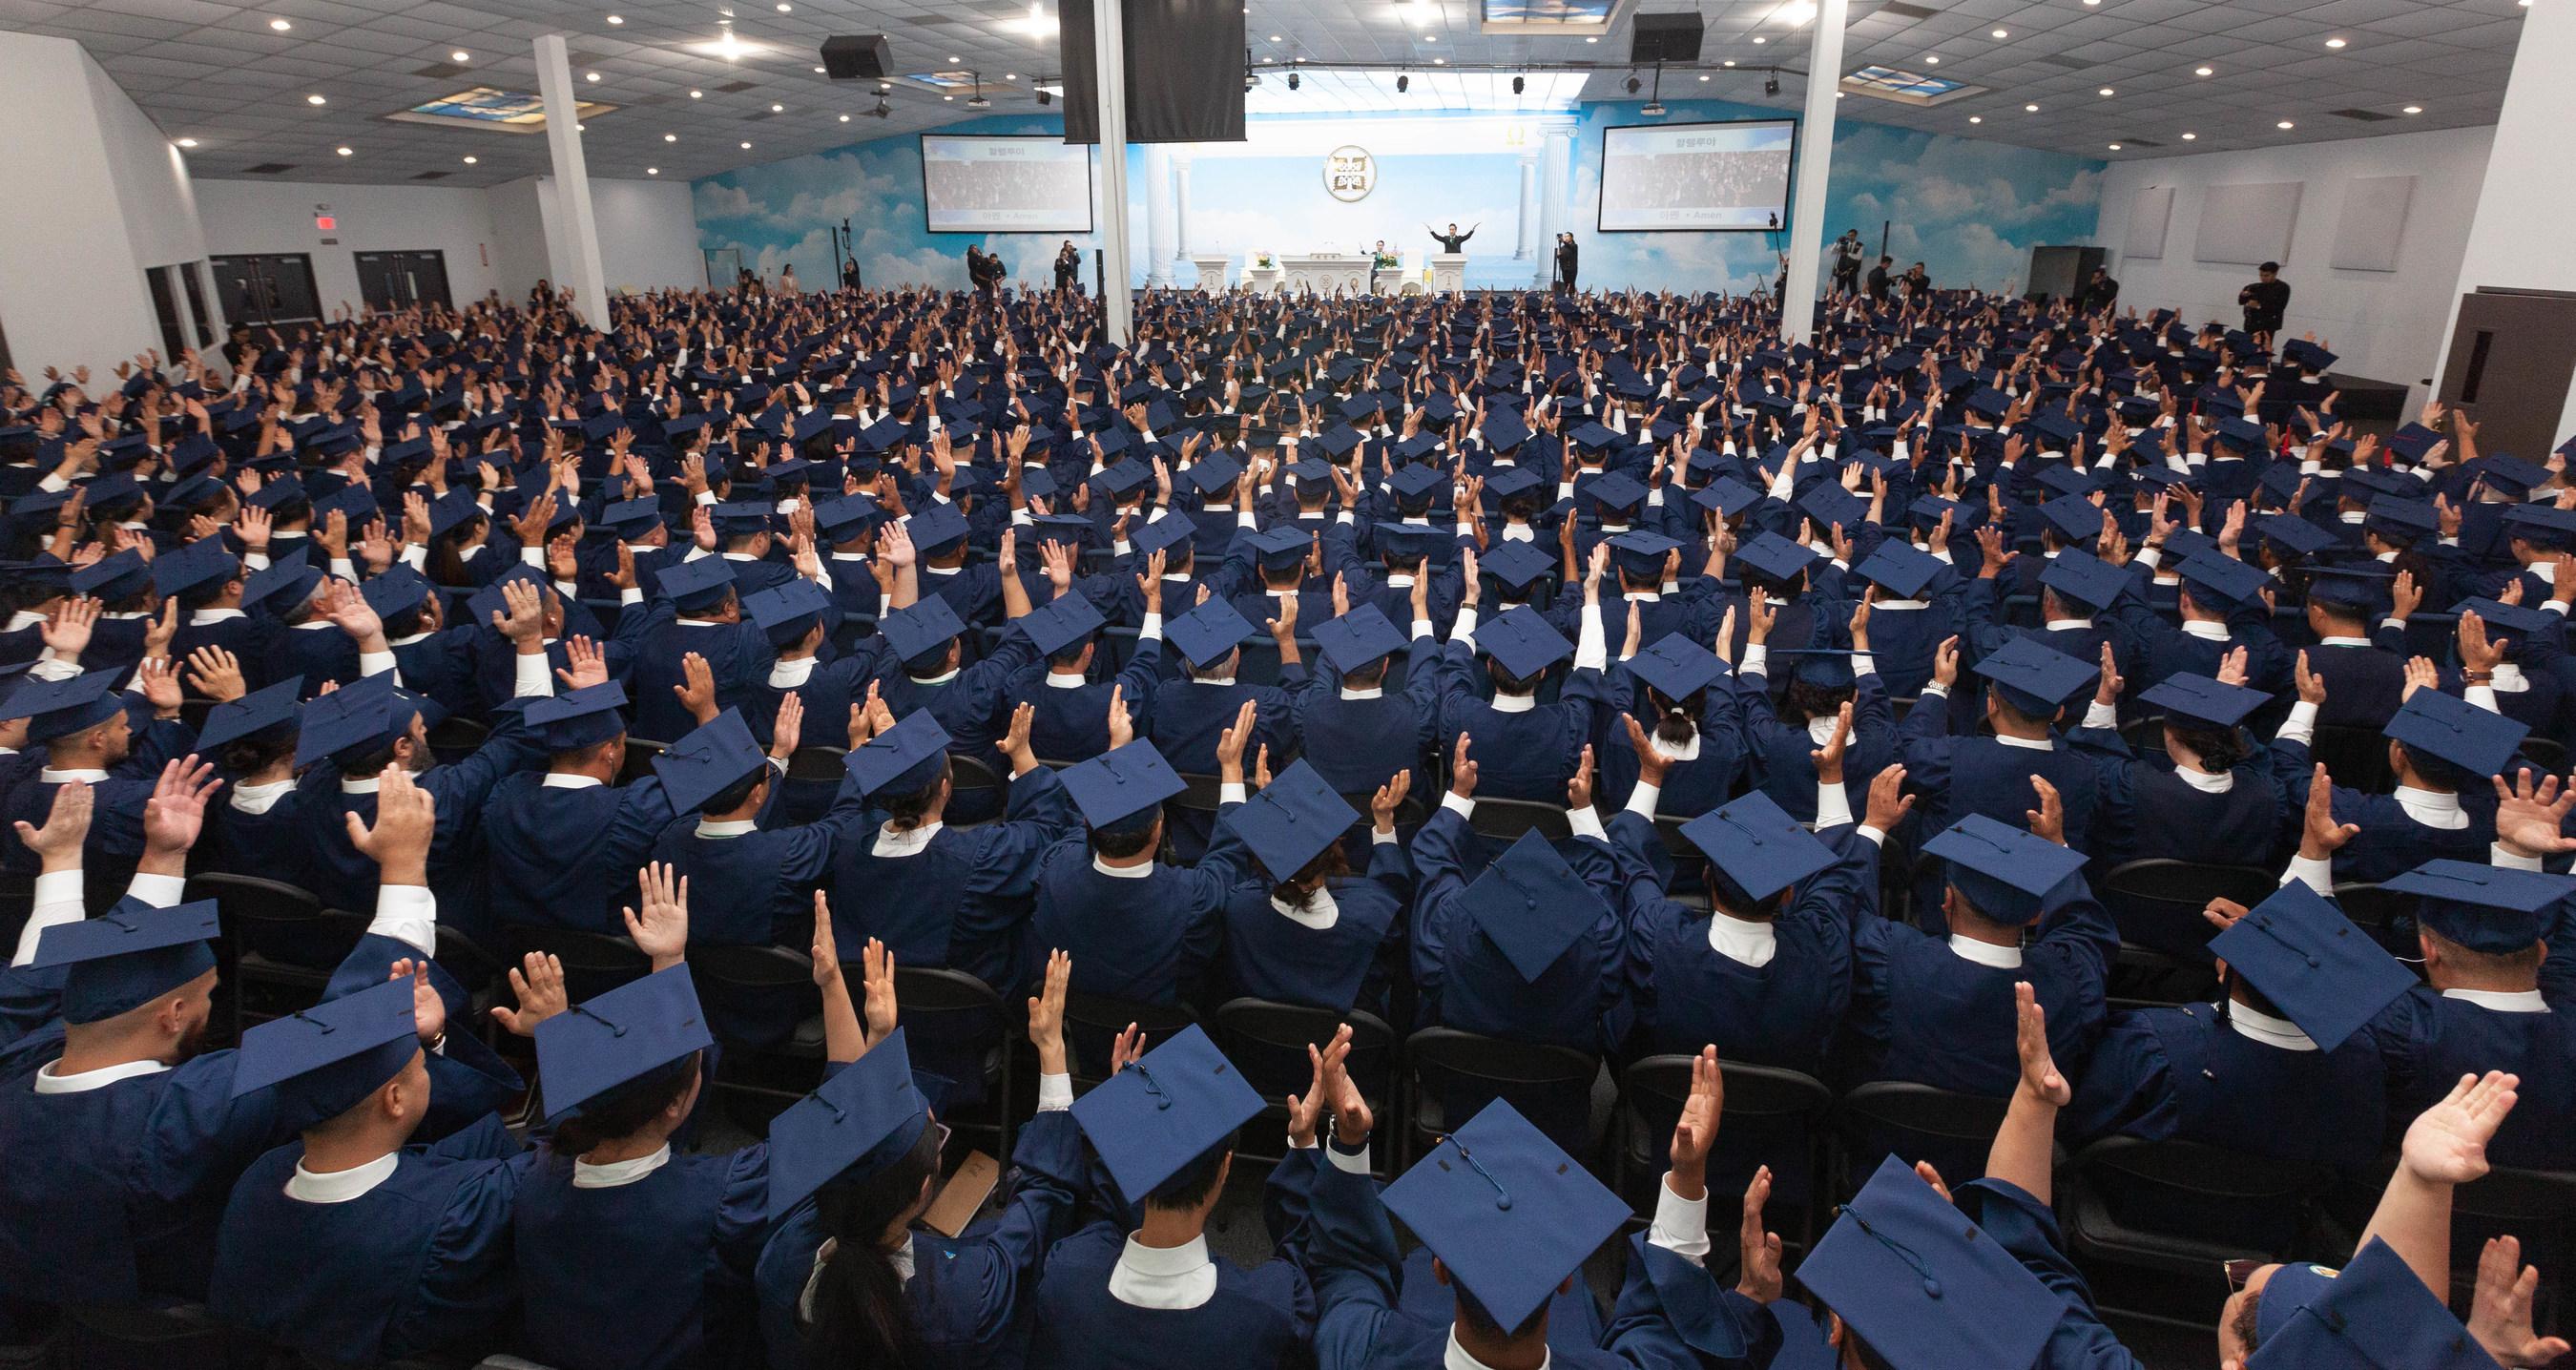 Shincheonji Church of Jesus Graduates 100,000 Students Worldwide